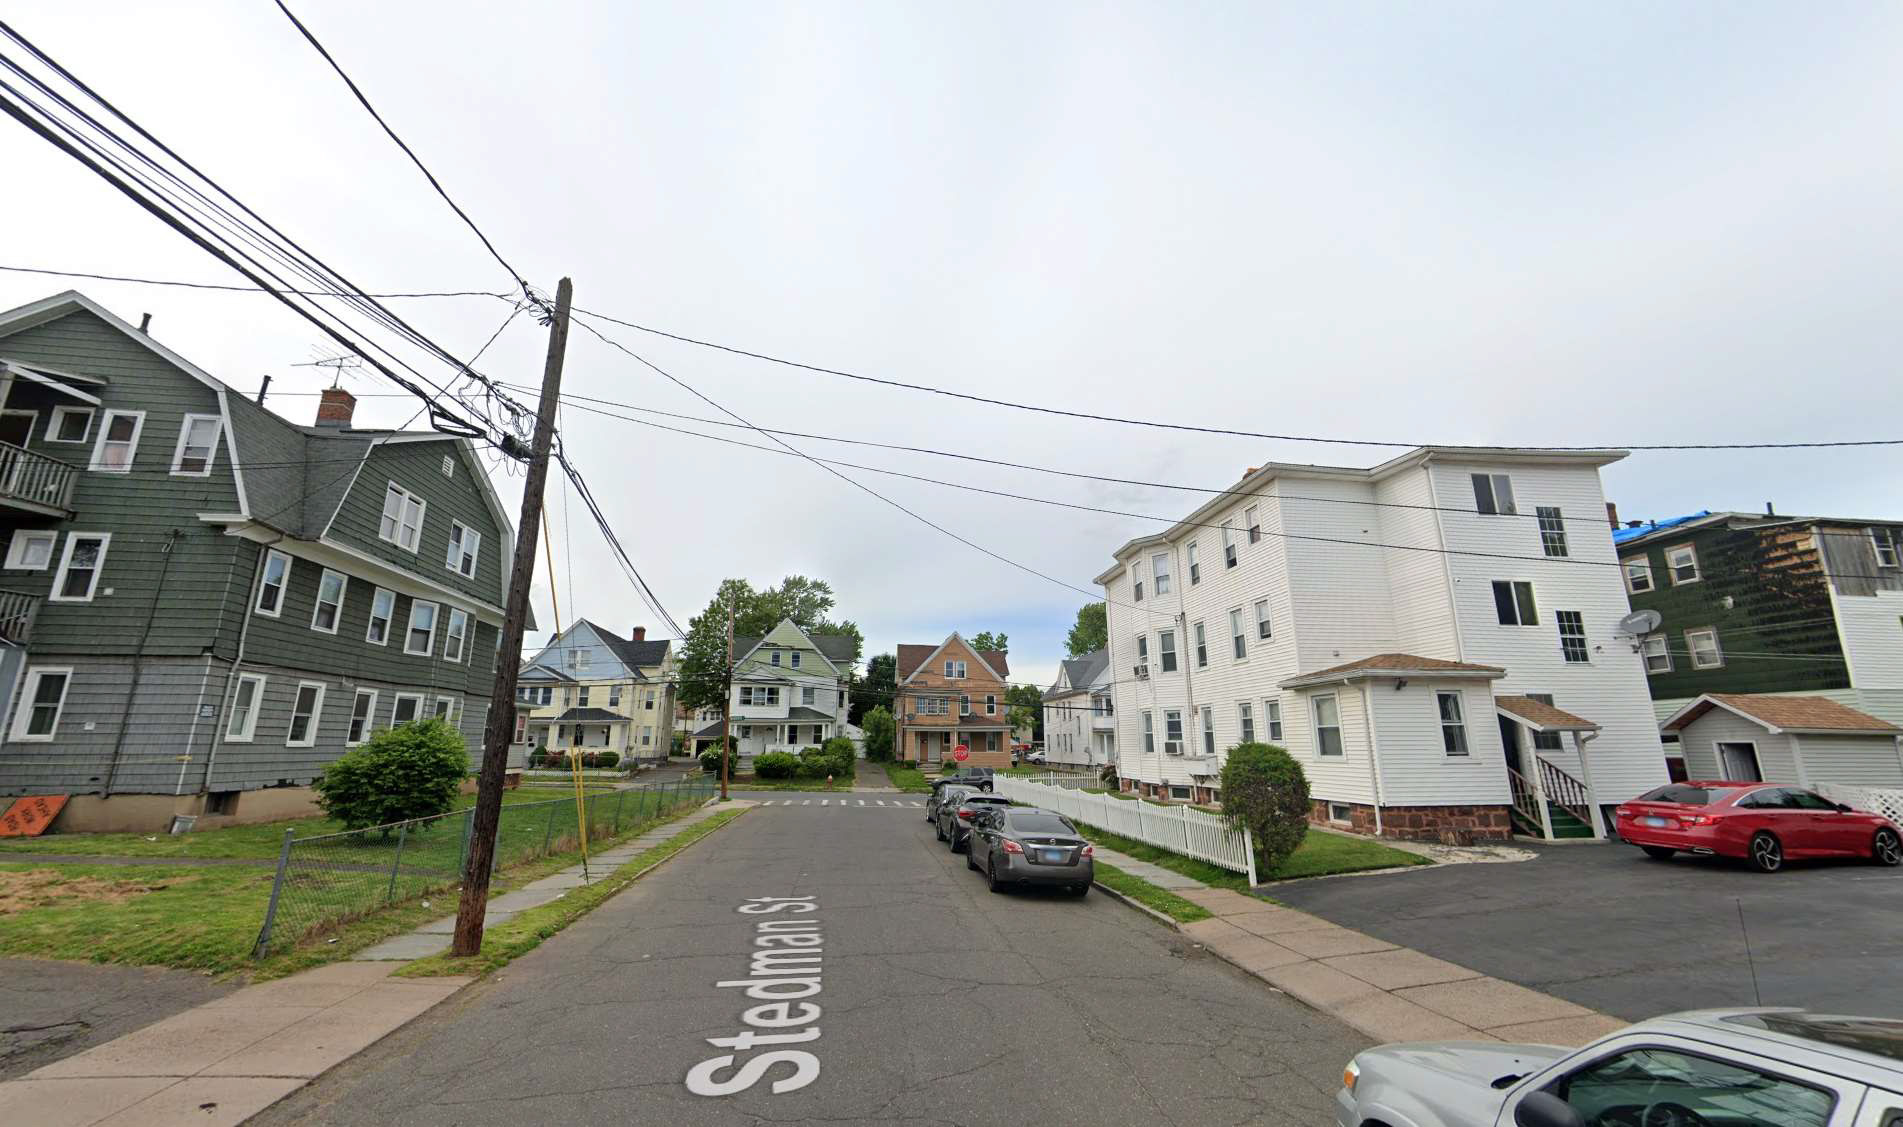 street view of very low opportunity neighborhood in Hartford, CT